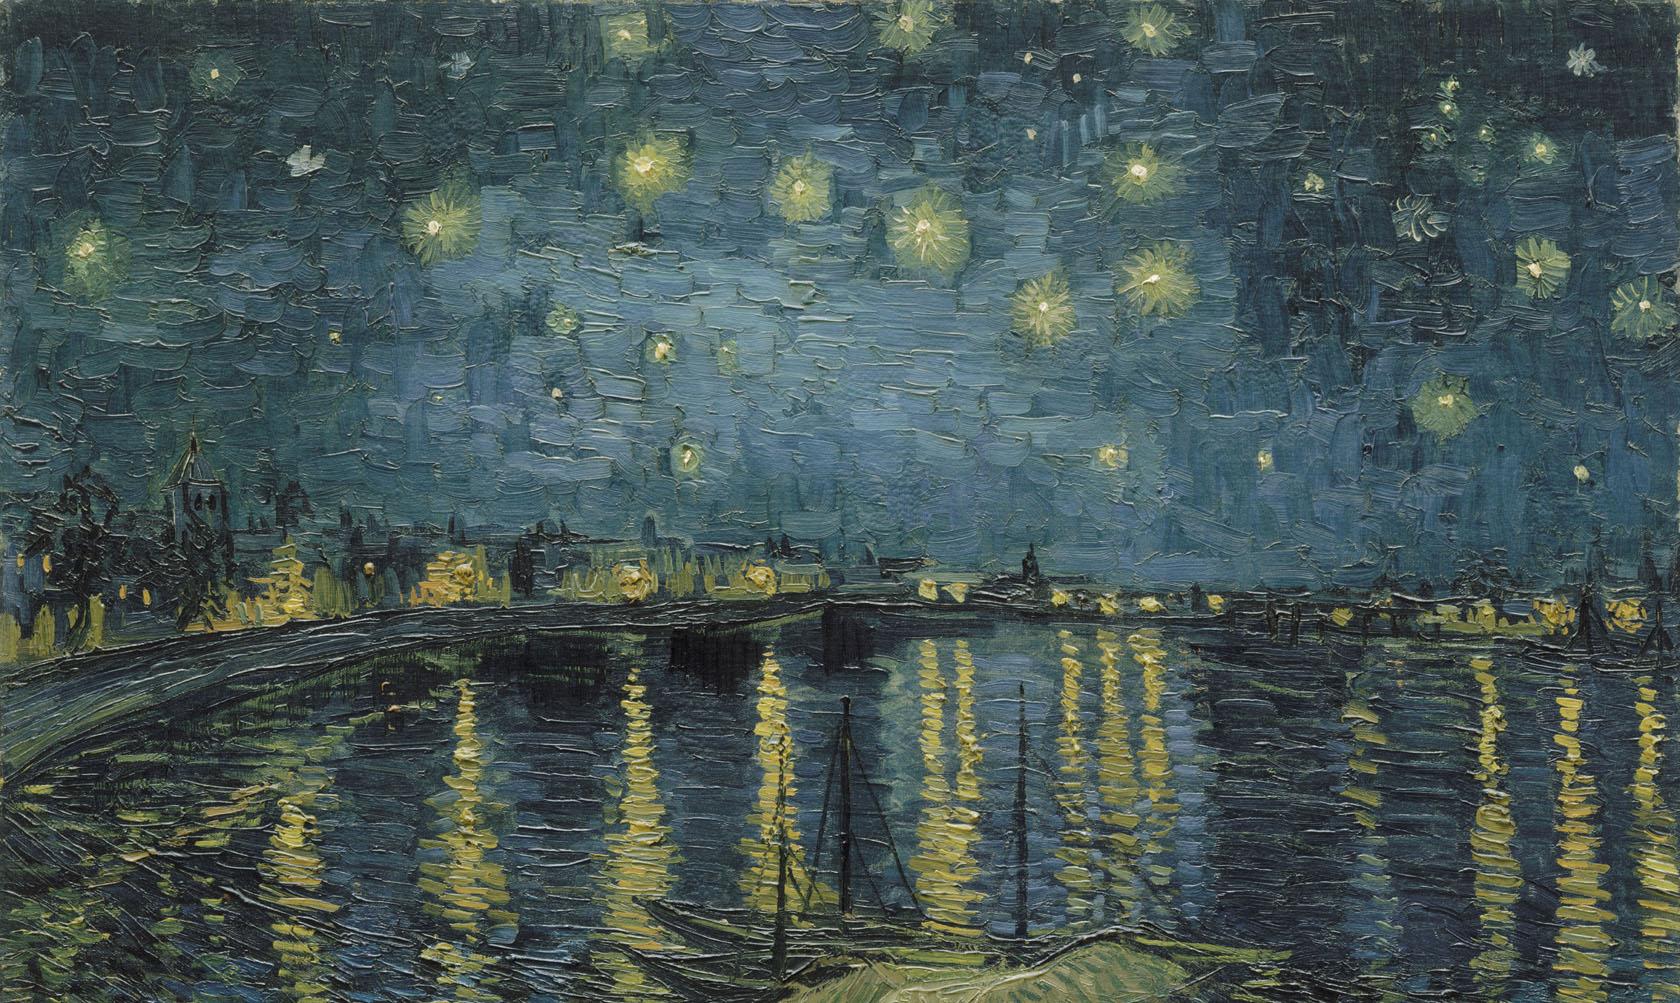 Vincent-van-Gogh-Sterrennacht-over-de-Rhône-detail-1888-Musée-d'Orsay